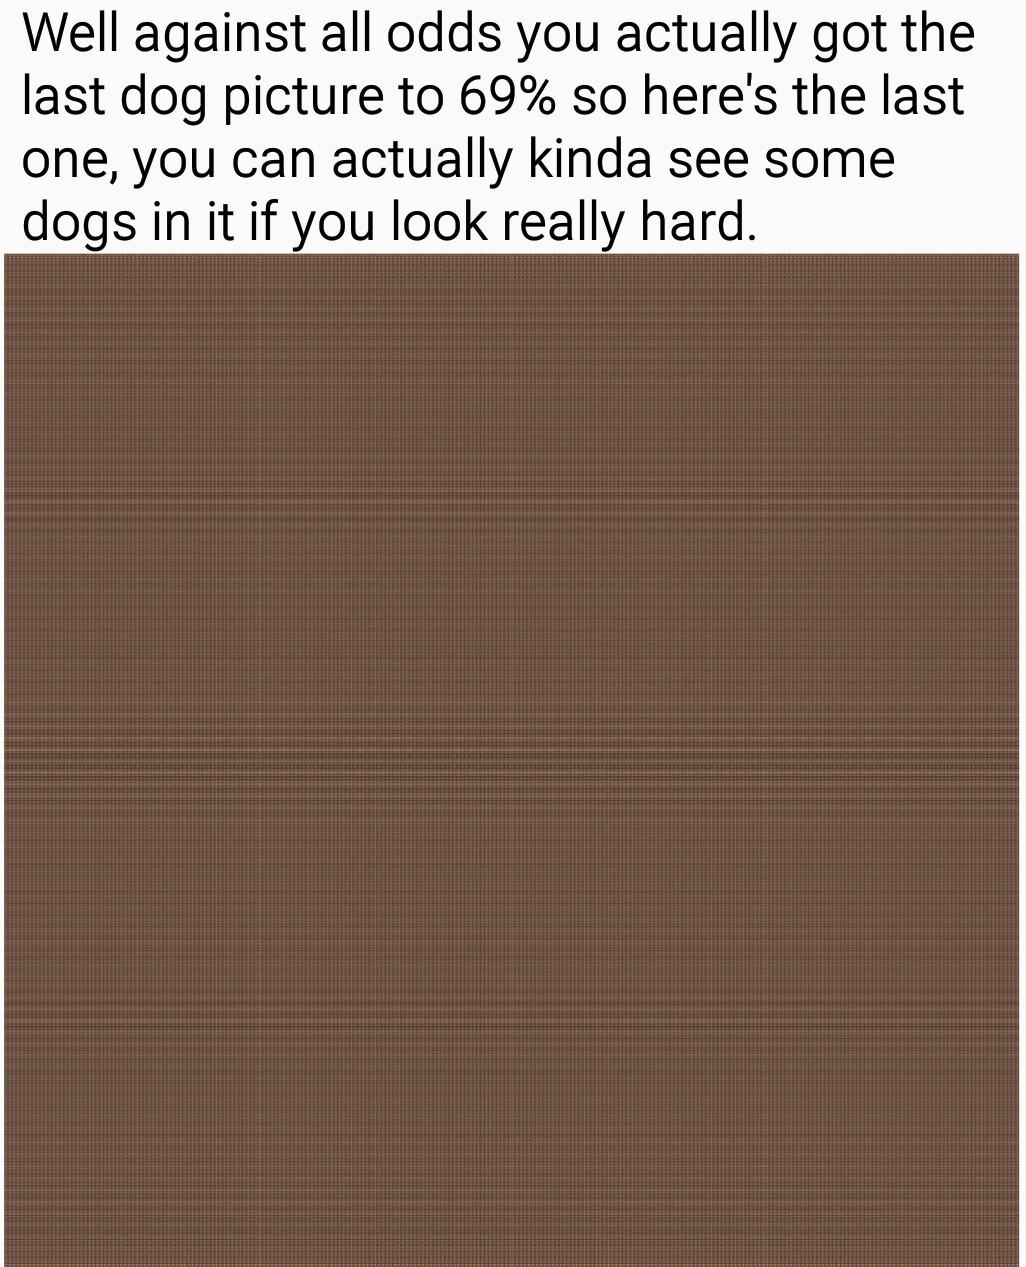 Discord__ is a basic bich. - meme